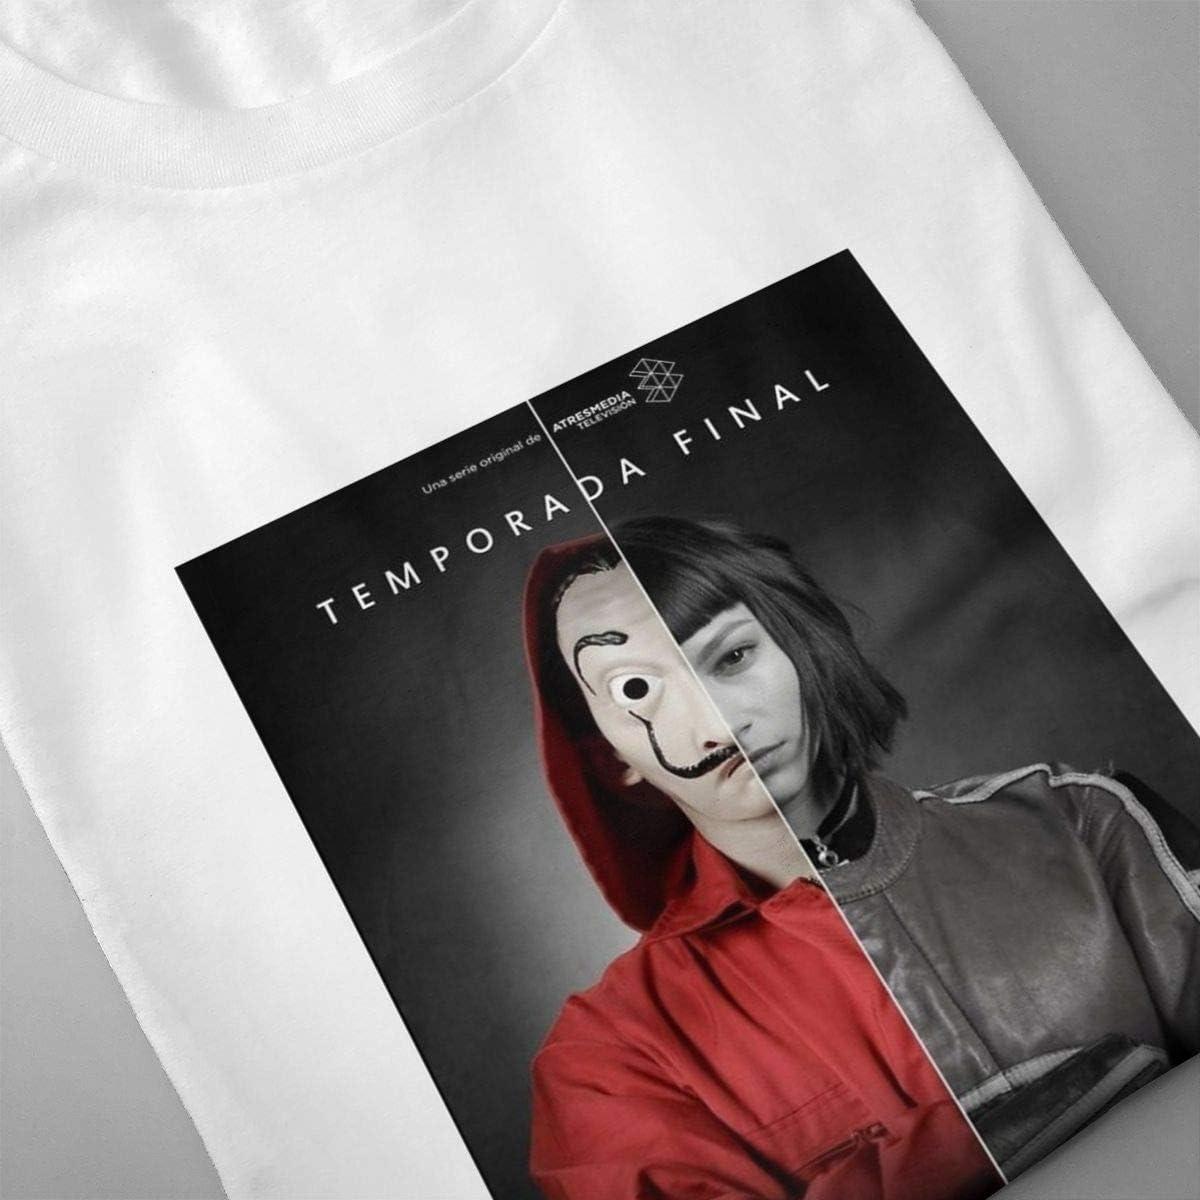 QINSHAONI La-Casa-de-Papel Teenagers Boy Retro Fashion Printed Letters Anime Pattern Comfortable Light T-Shirt T-Shirts L